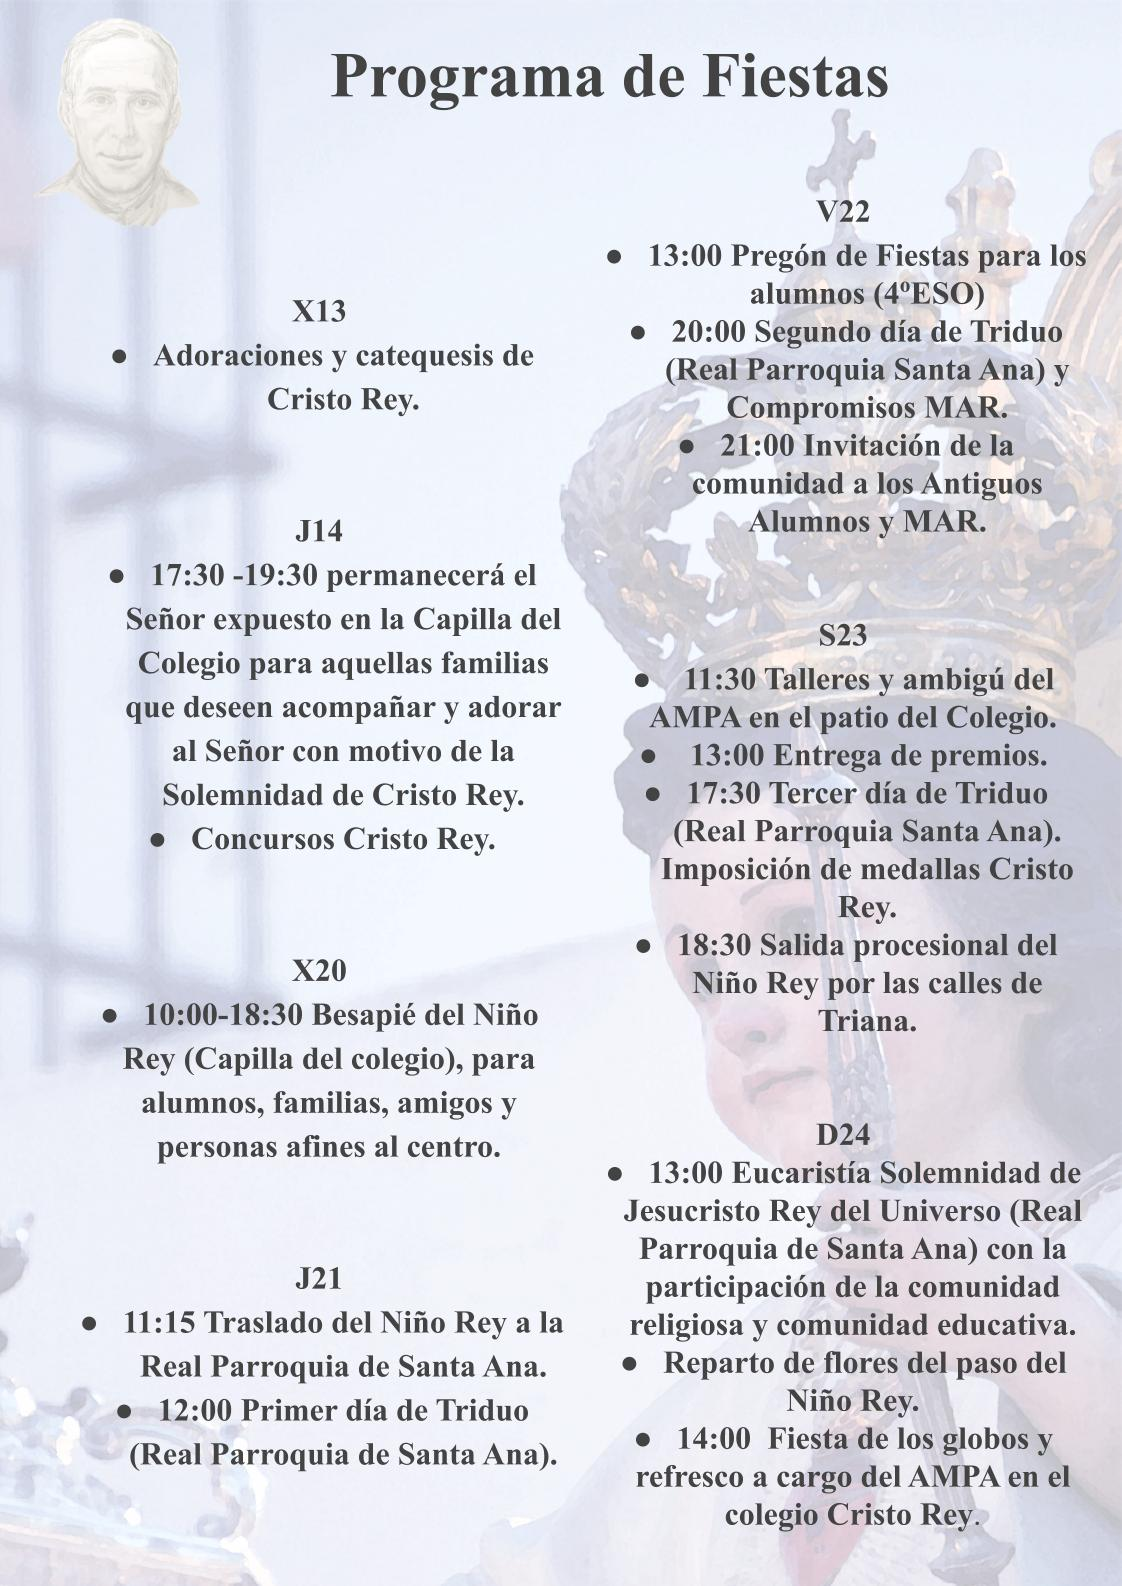 PROGRAMA DE FIESTA CRISTO REY SEVILLA 2019